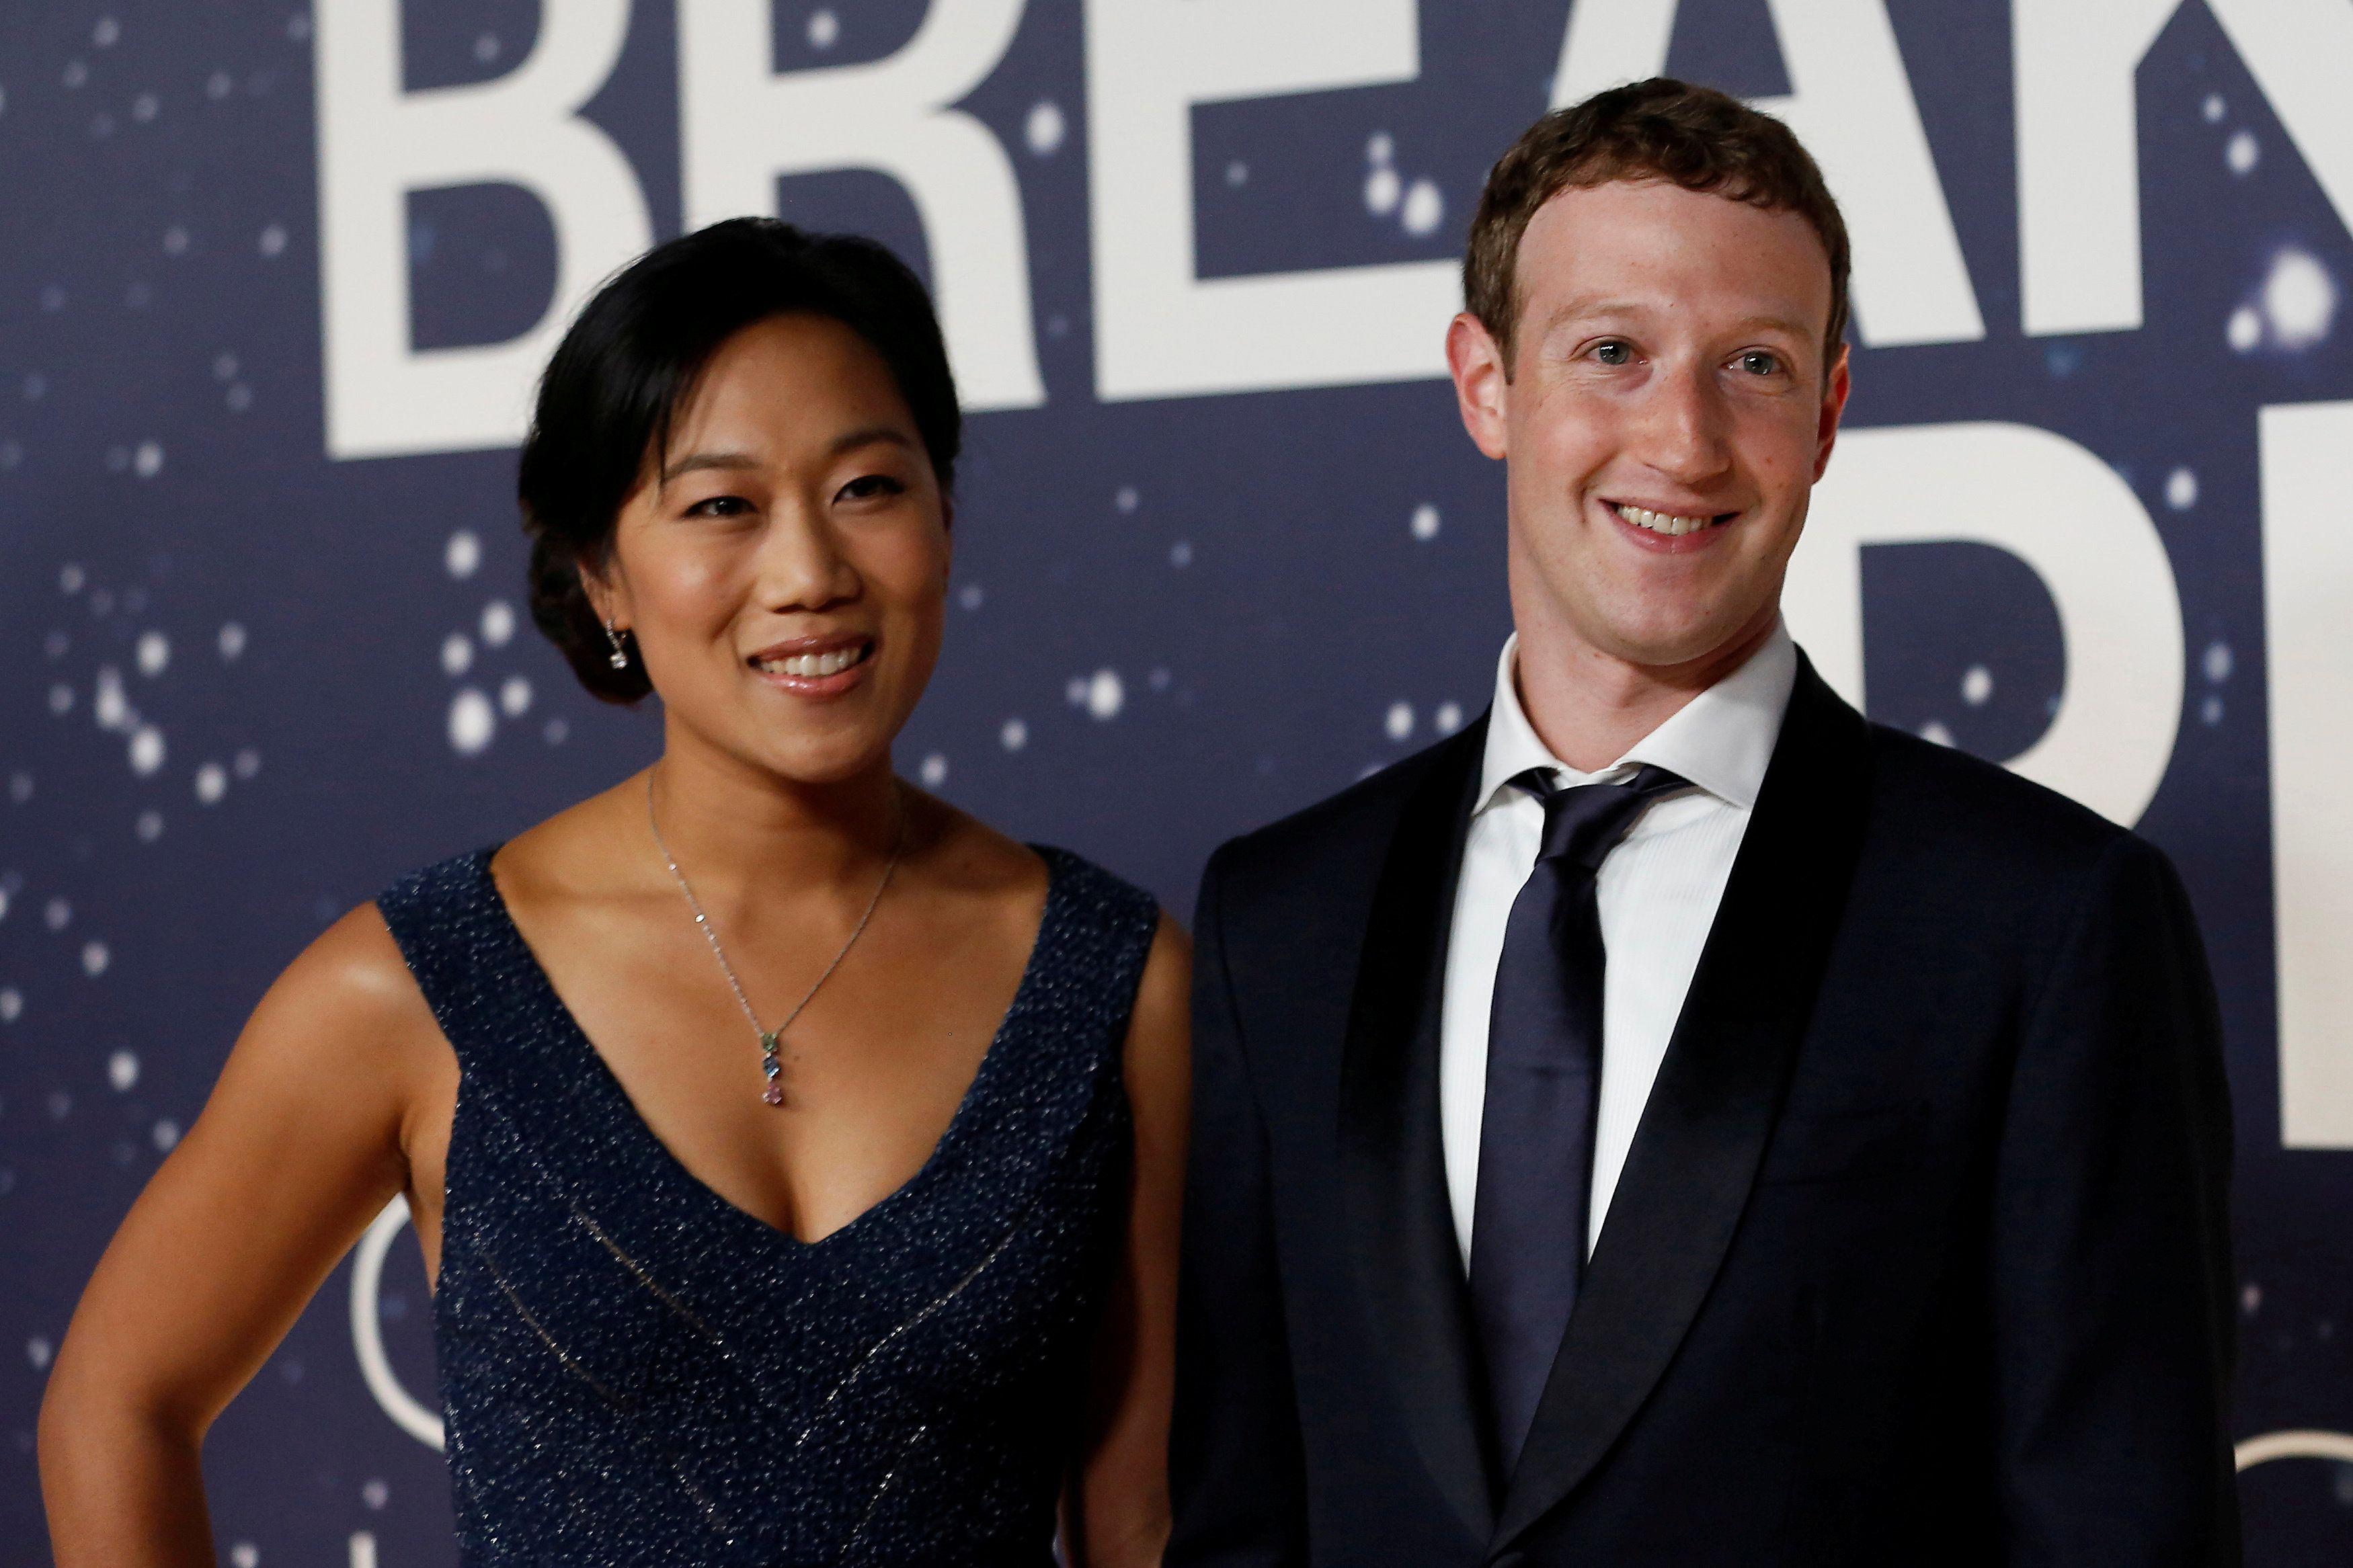 Facebook CEO Mark Zuckerberg and his wife, Priscilla Chan. Reuters